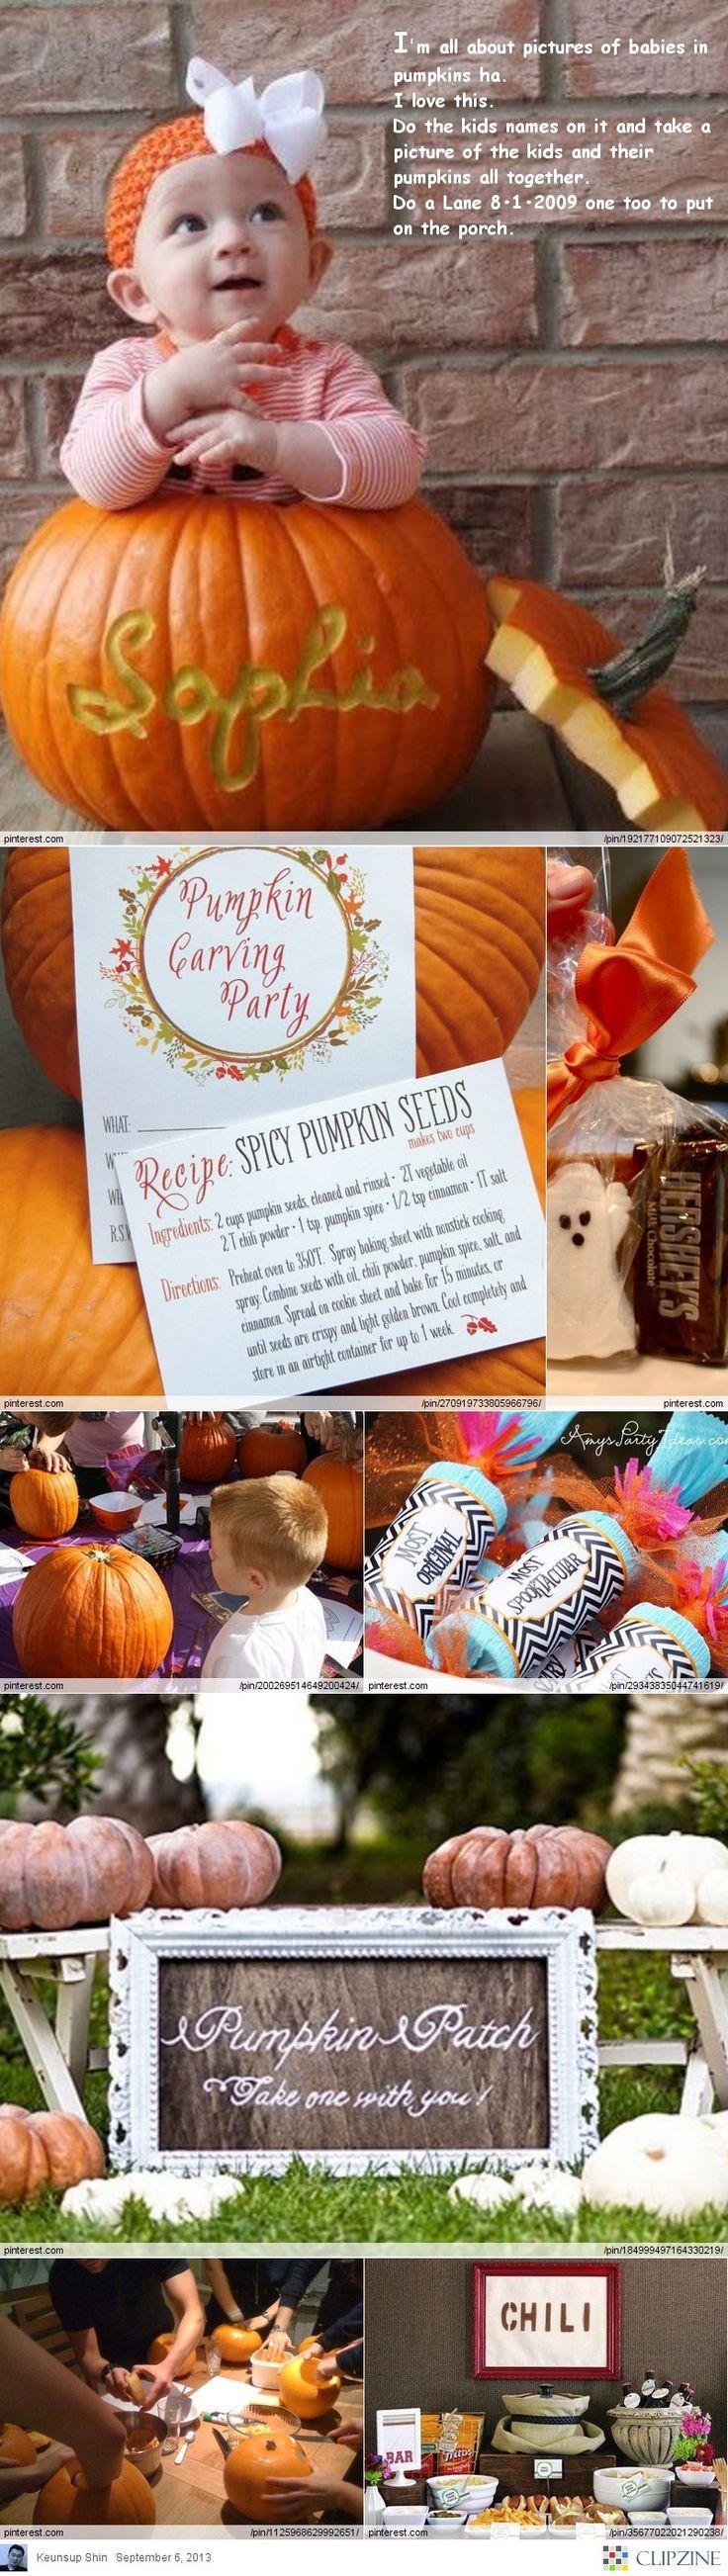 Creative Pumpkin Party Ideas--- I like the name carved into the pumpkin!